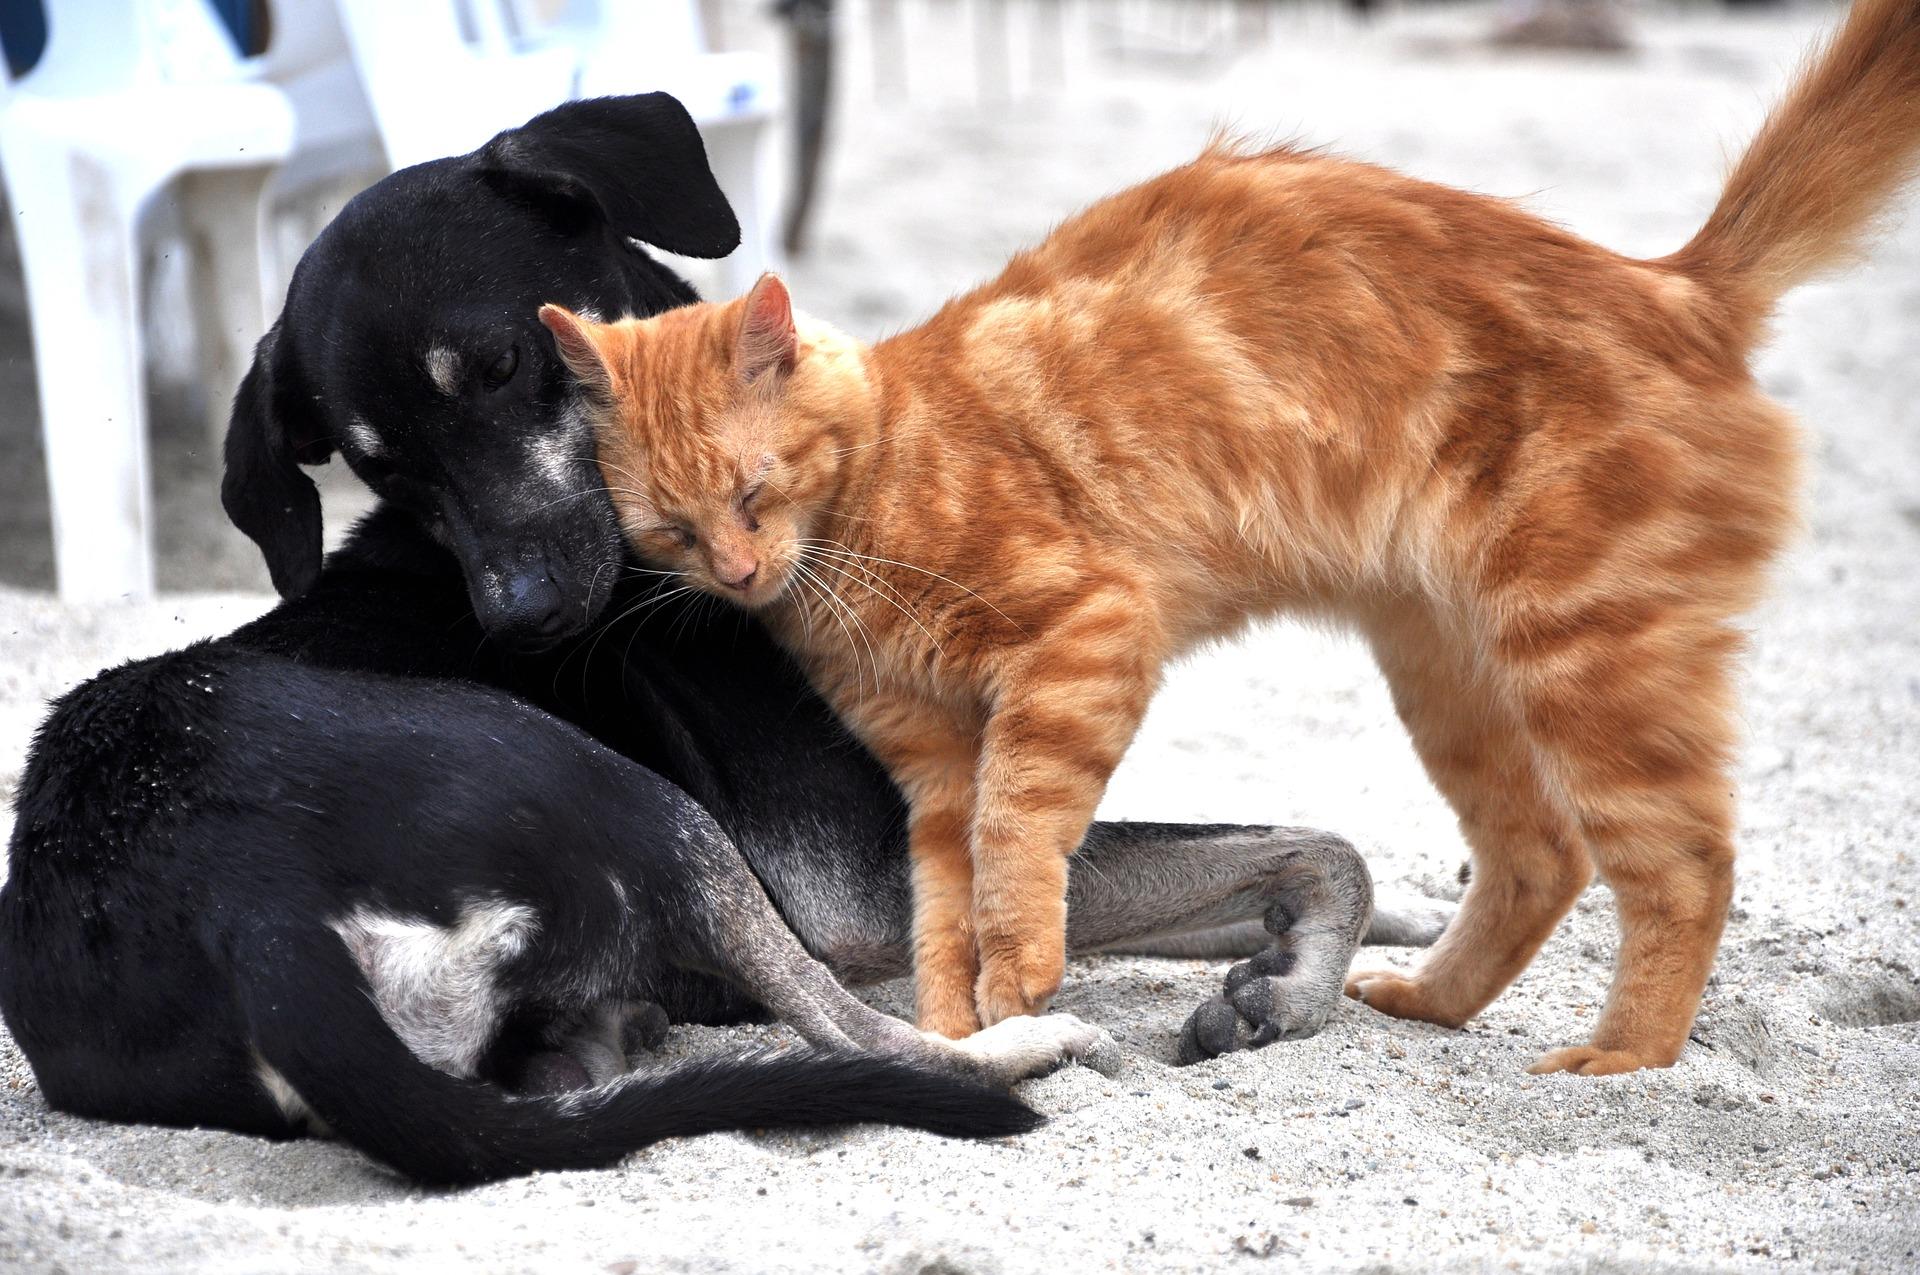 dogcatpic.jpg